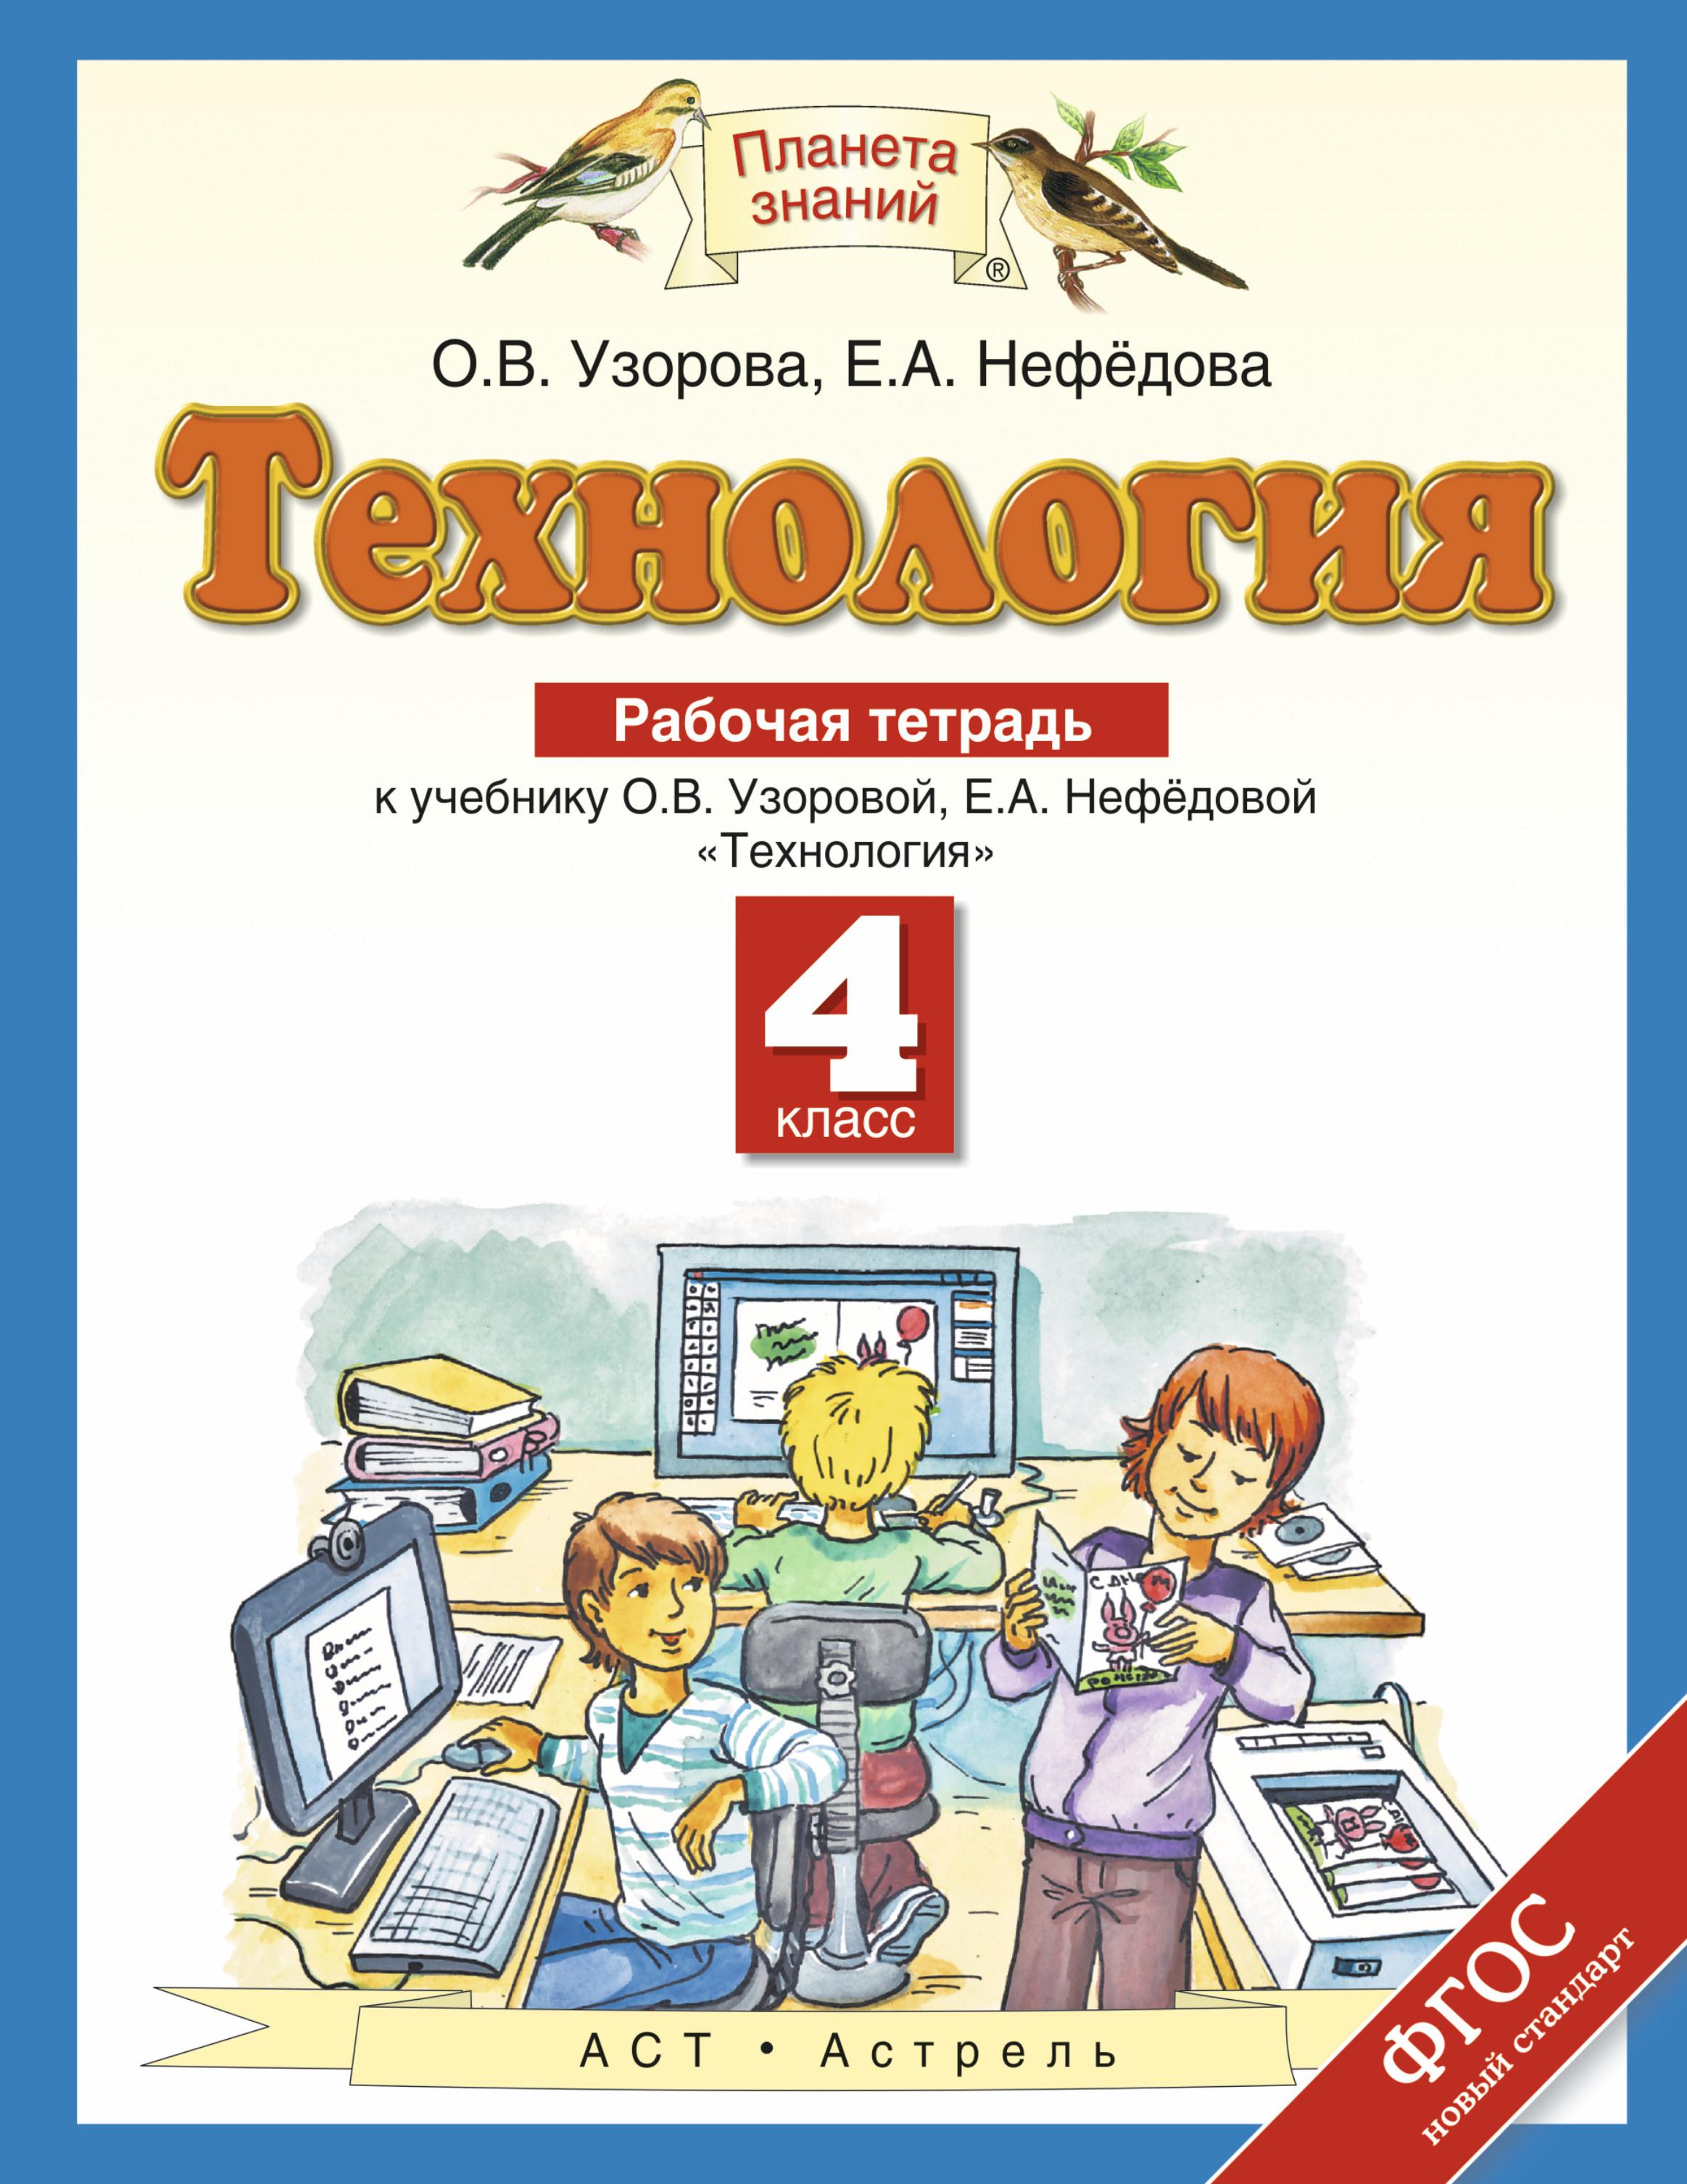 Технология. 4 класс. Рабочая тетрадь ( Узорова О.В., Нефедова Е.А.  )